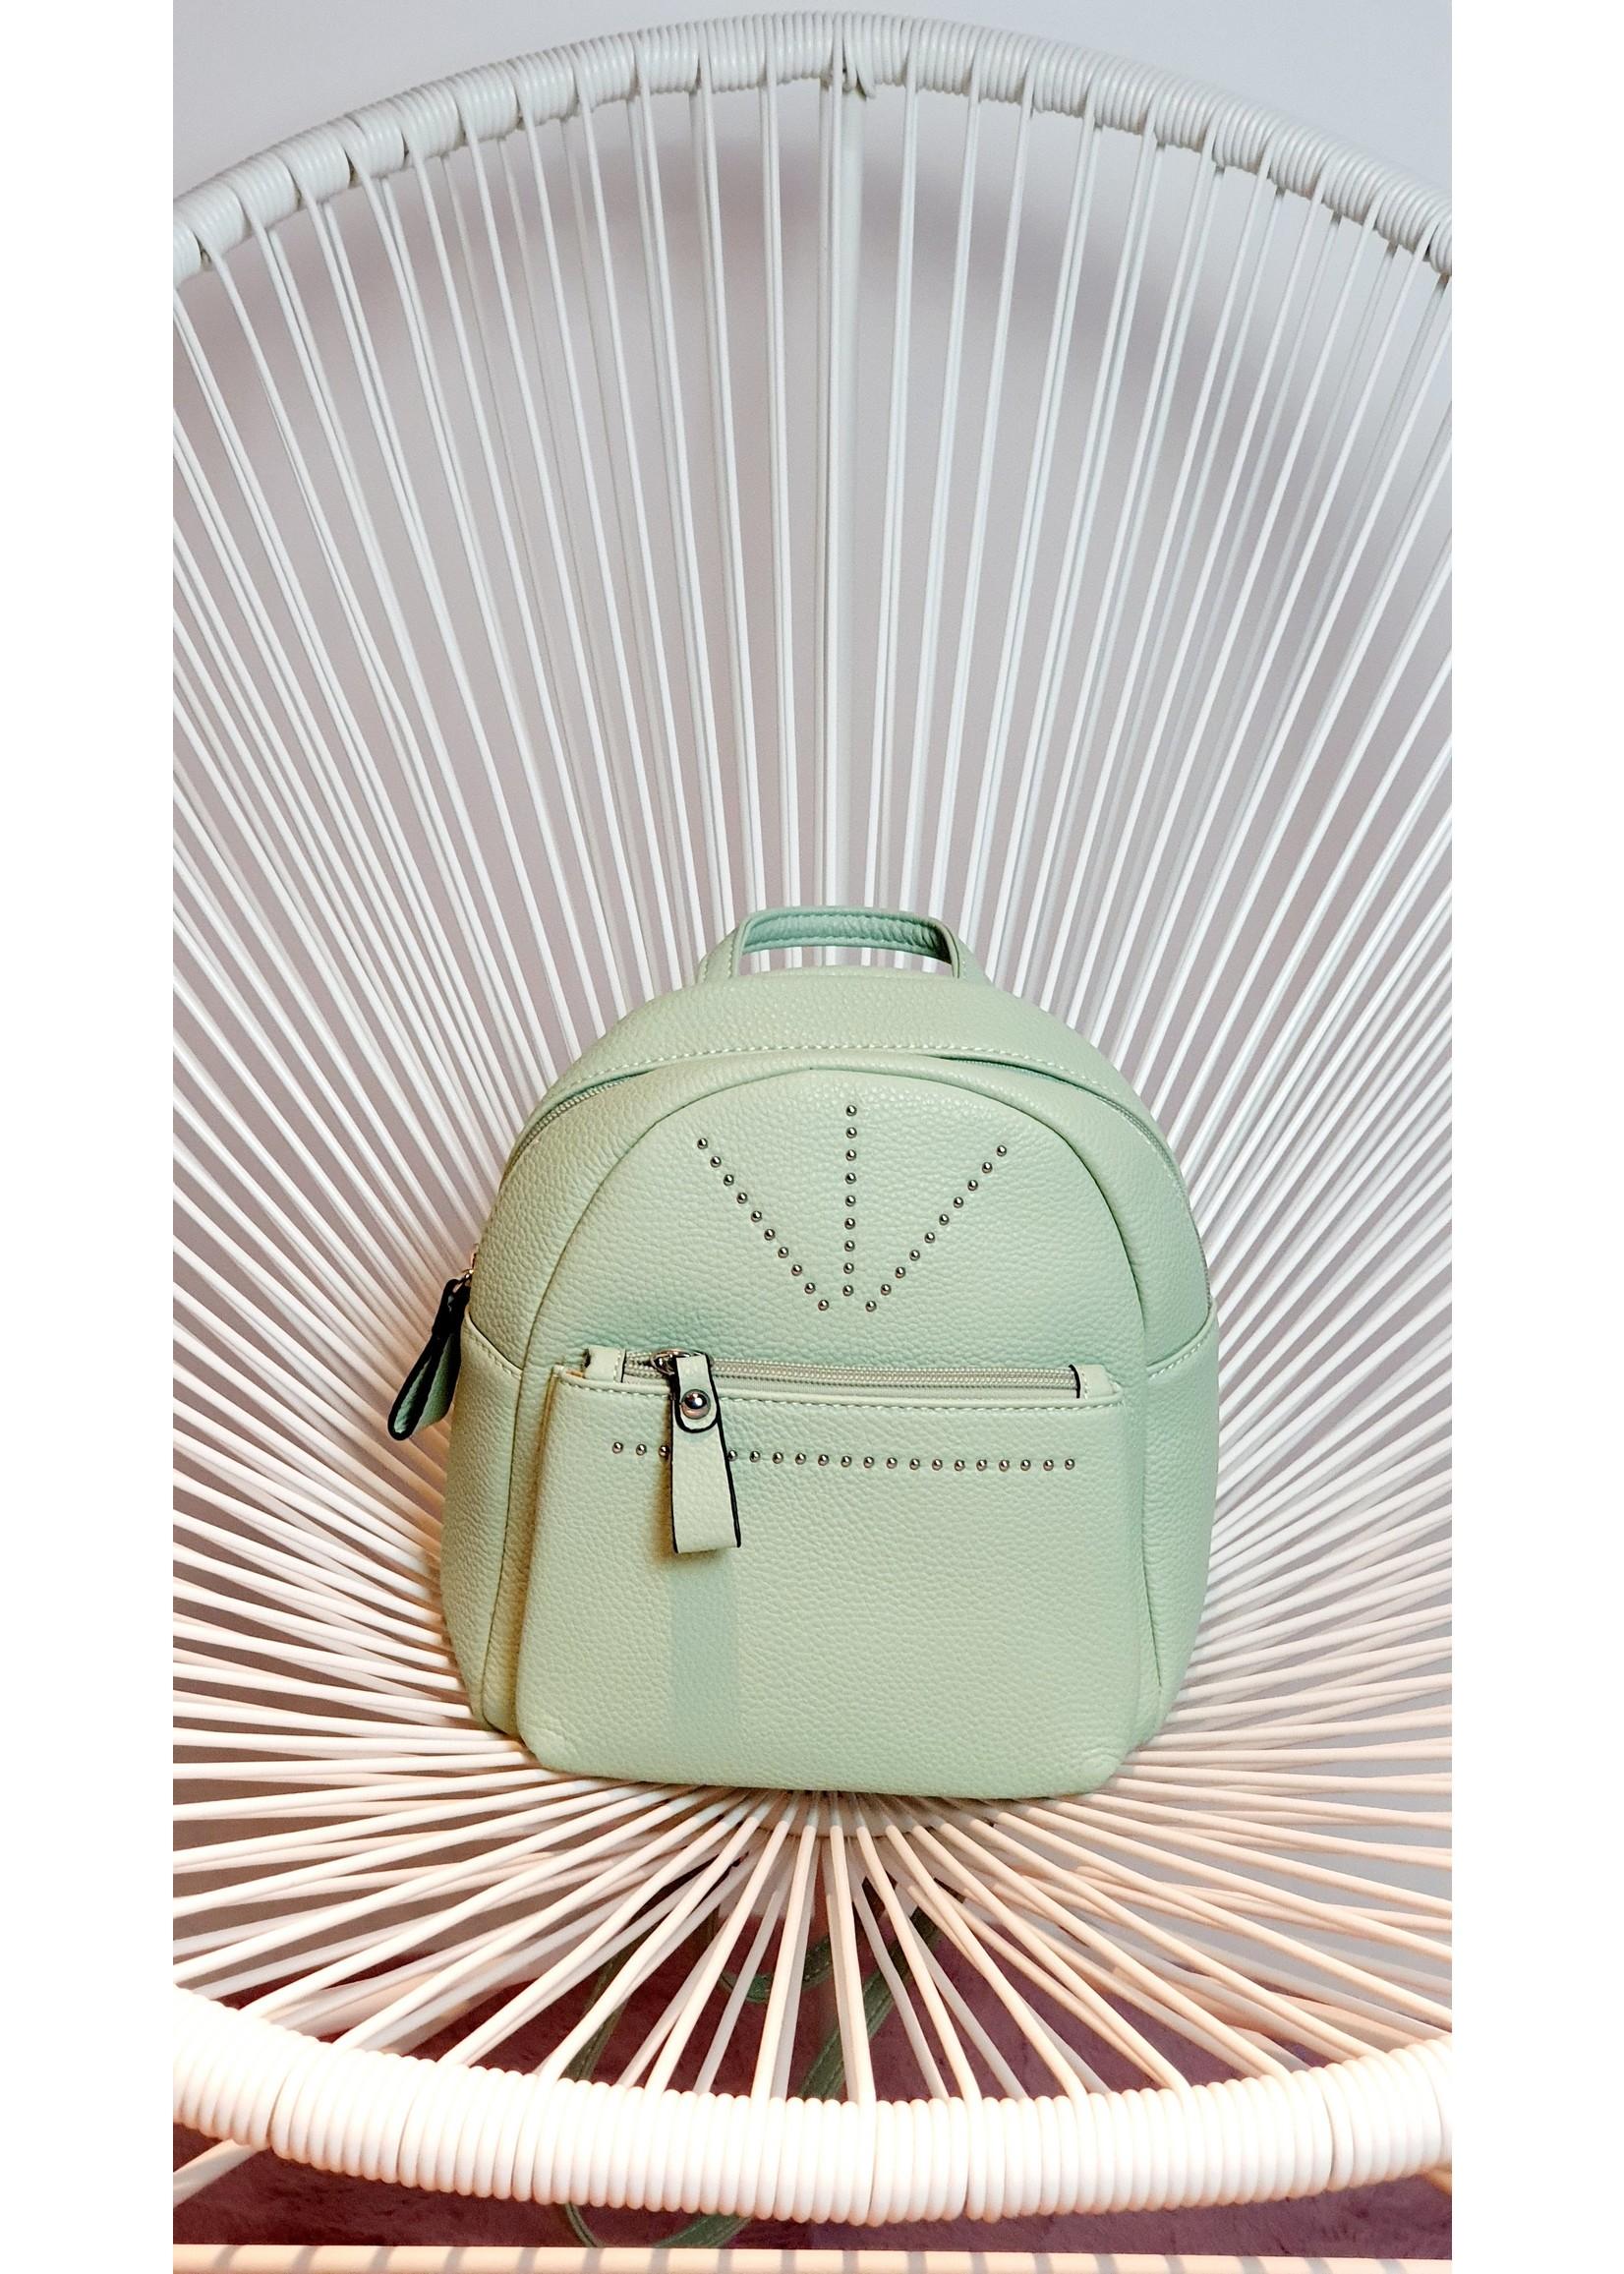 Thé cutie backpack